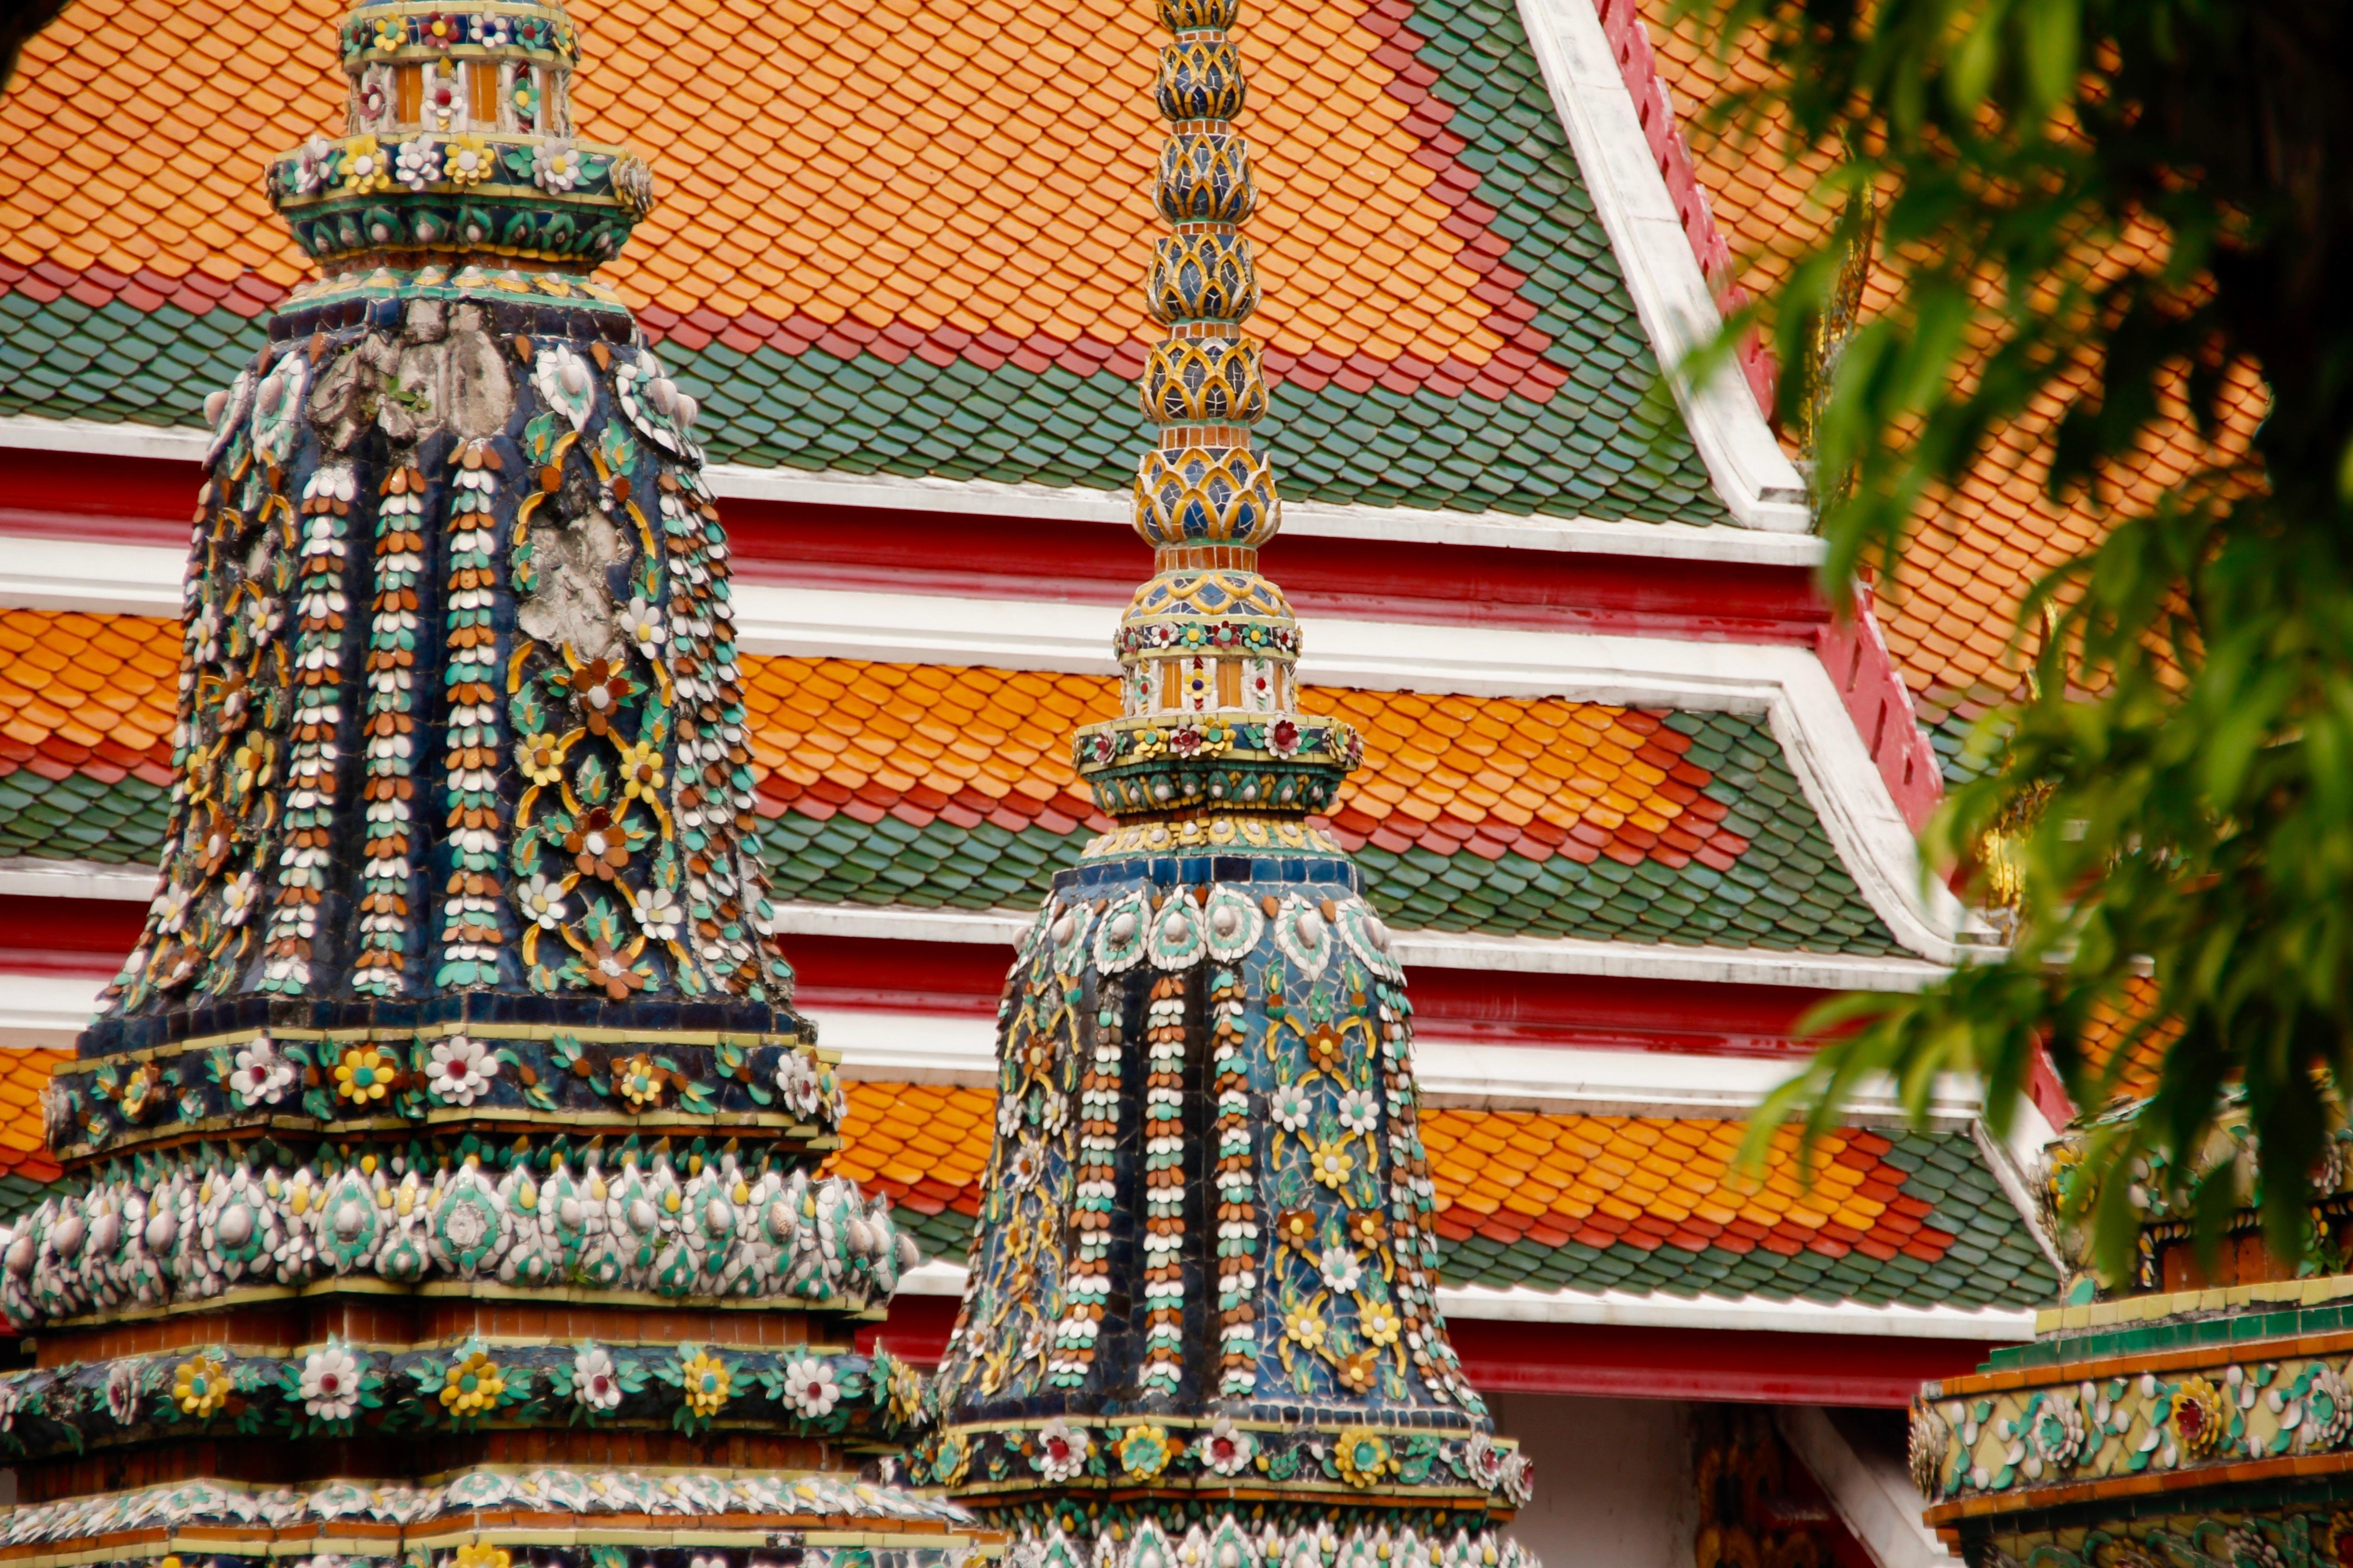 free images building decoration tower buddhism asia landmark